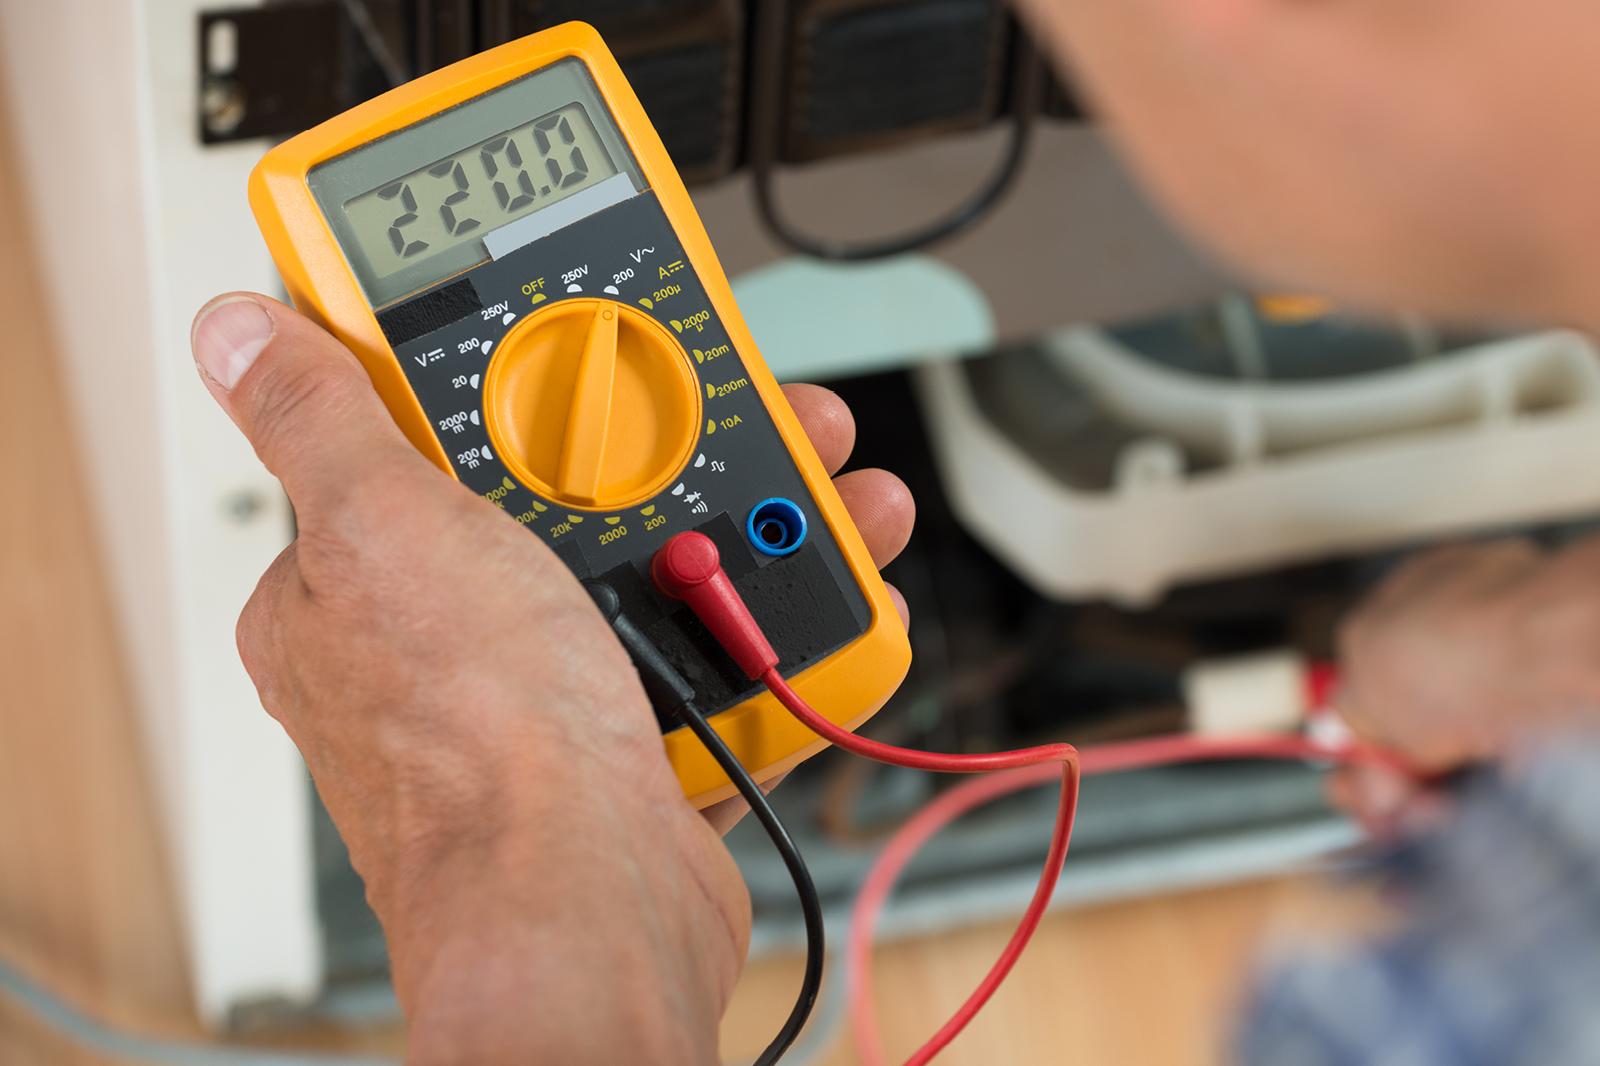 aec electrical contractors southampton hamphirePeriodic Testing Electricians Southamptonelectricians Southampton #6